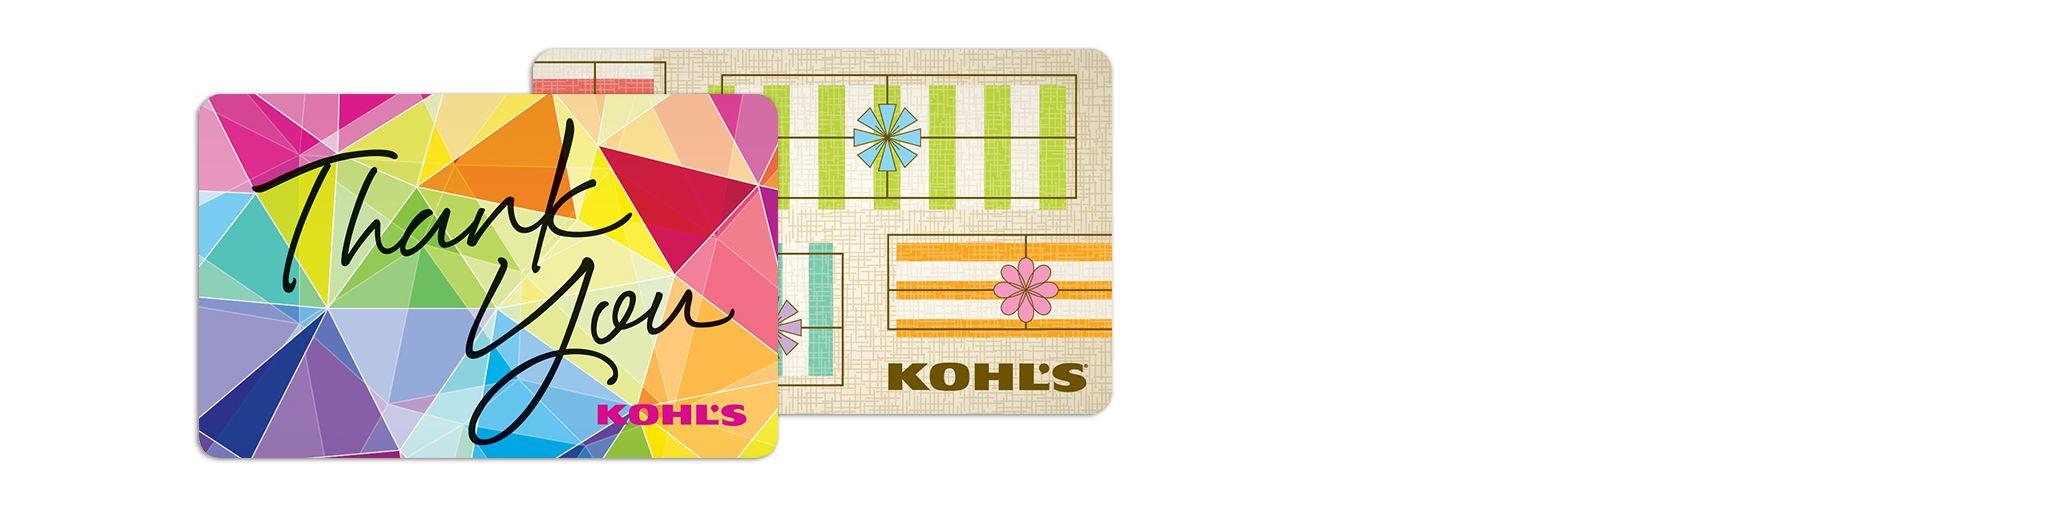 Kohls Wedding Registry Gift Card Oznames For